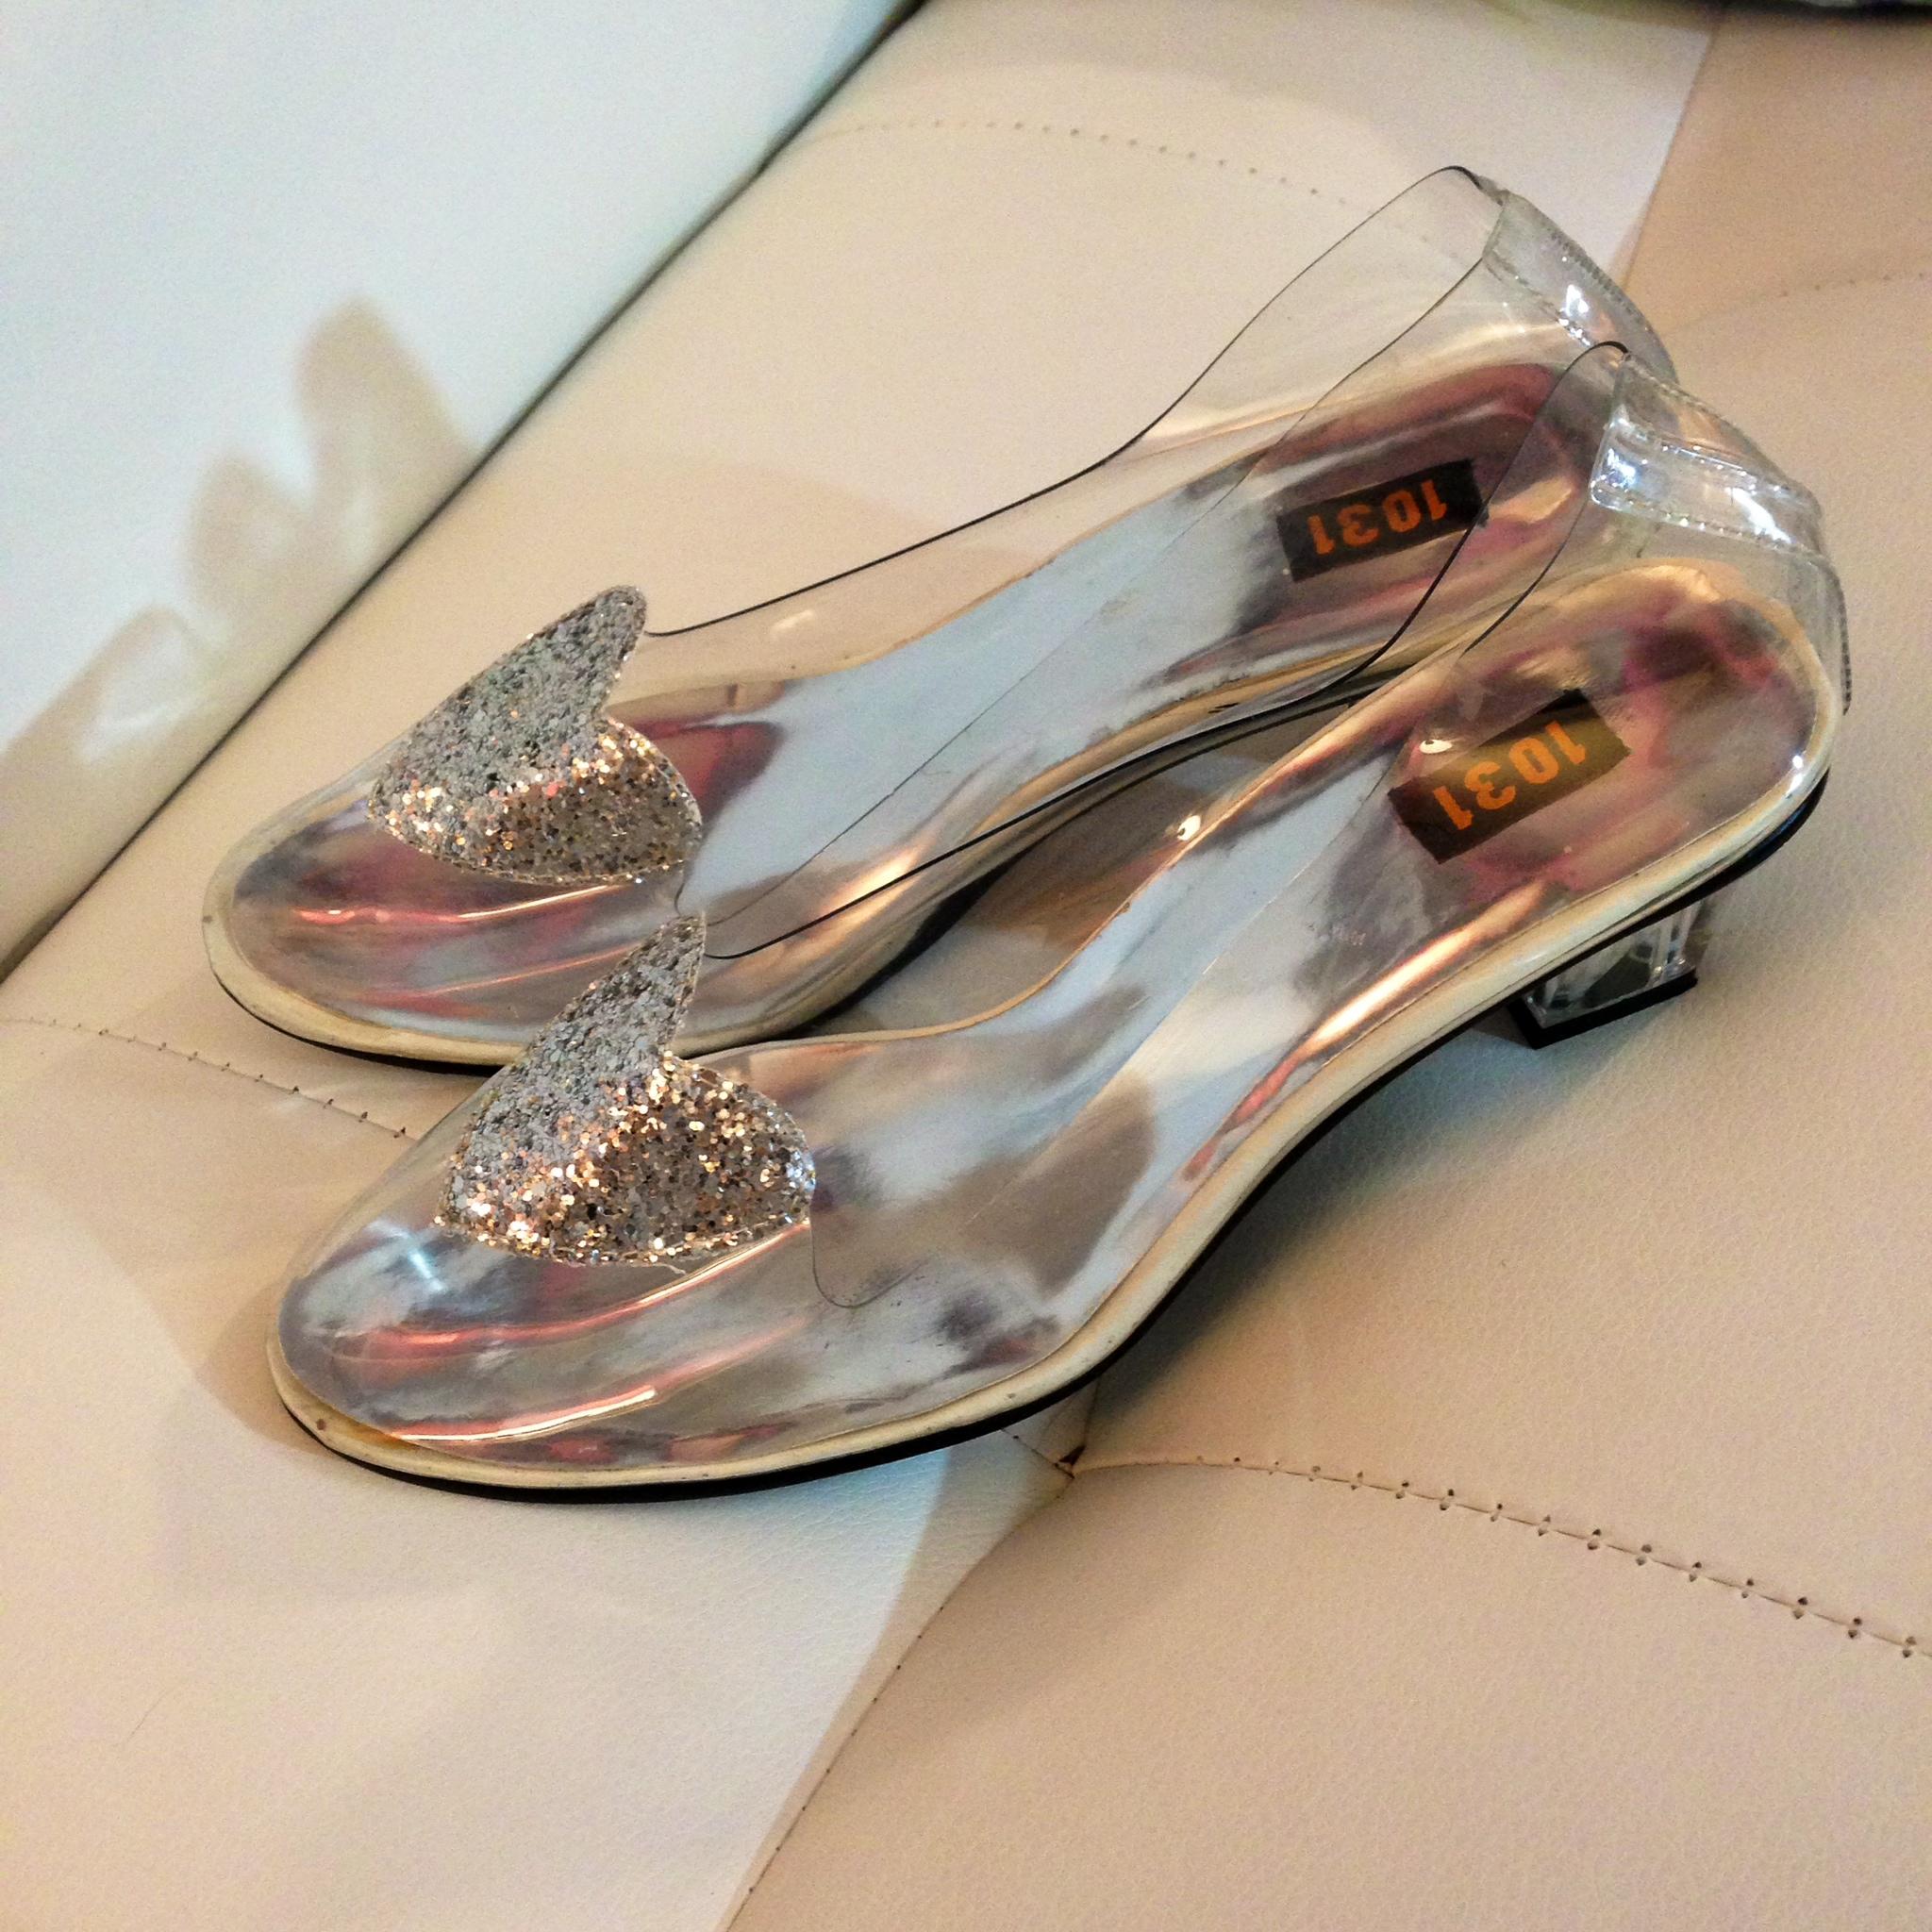 f95c1499012 1031 Clear Transparent Jelly Silver Sparkle Heart Kawaii heel ...